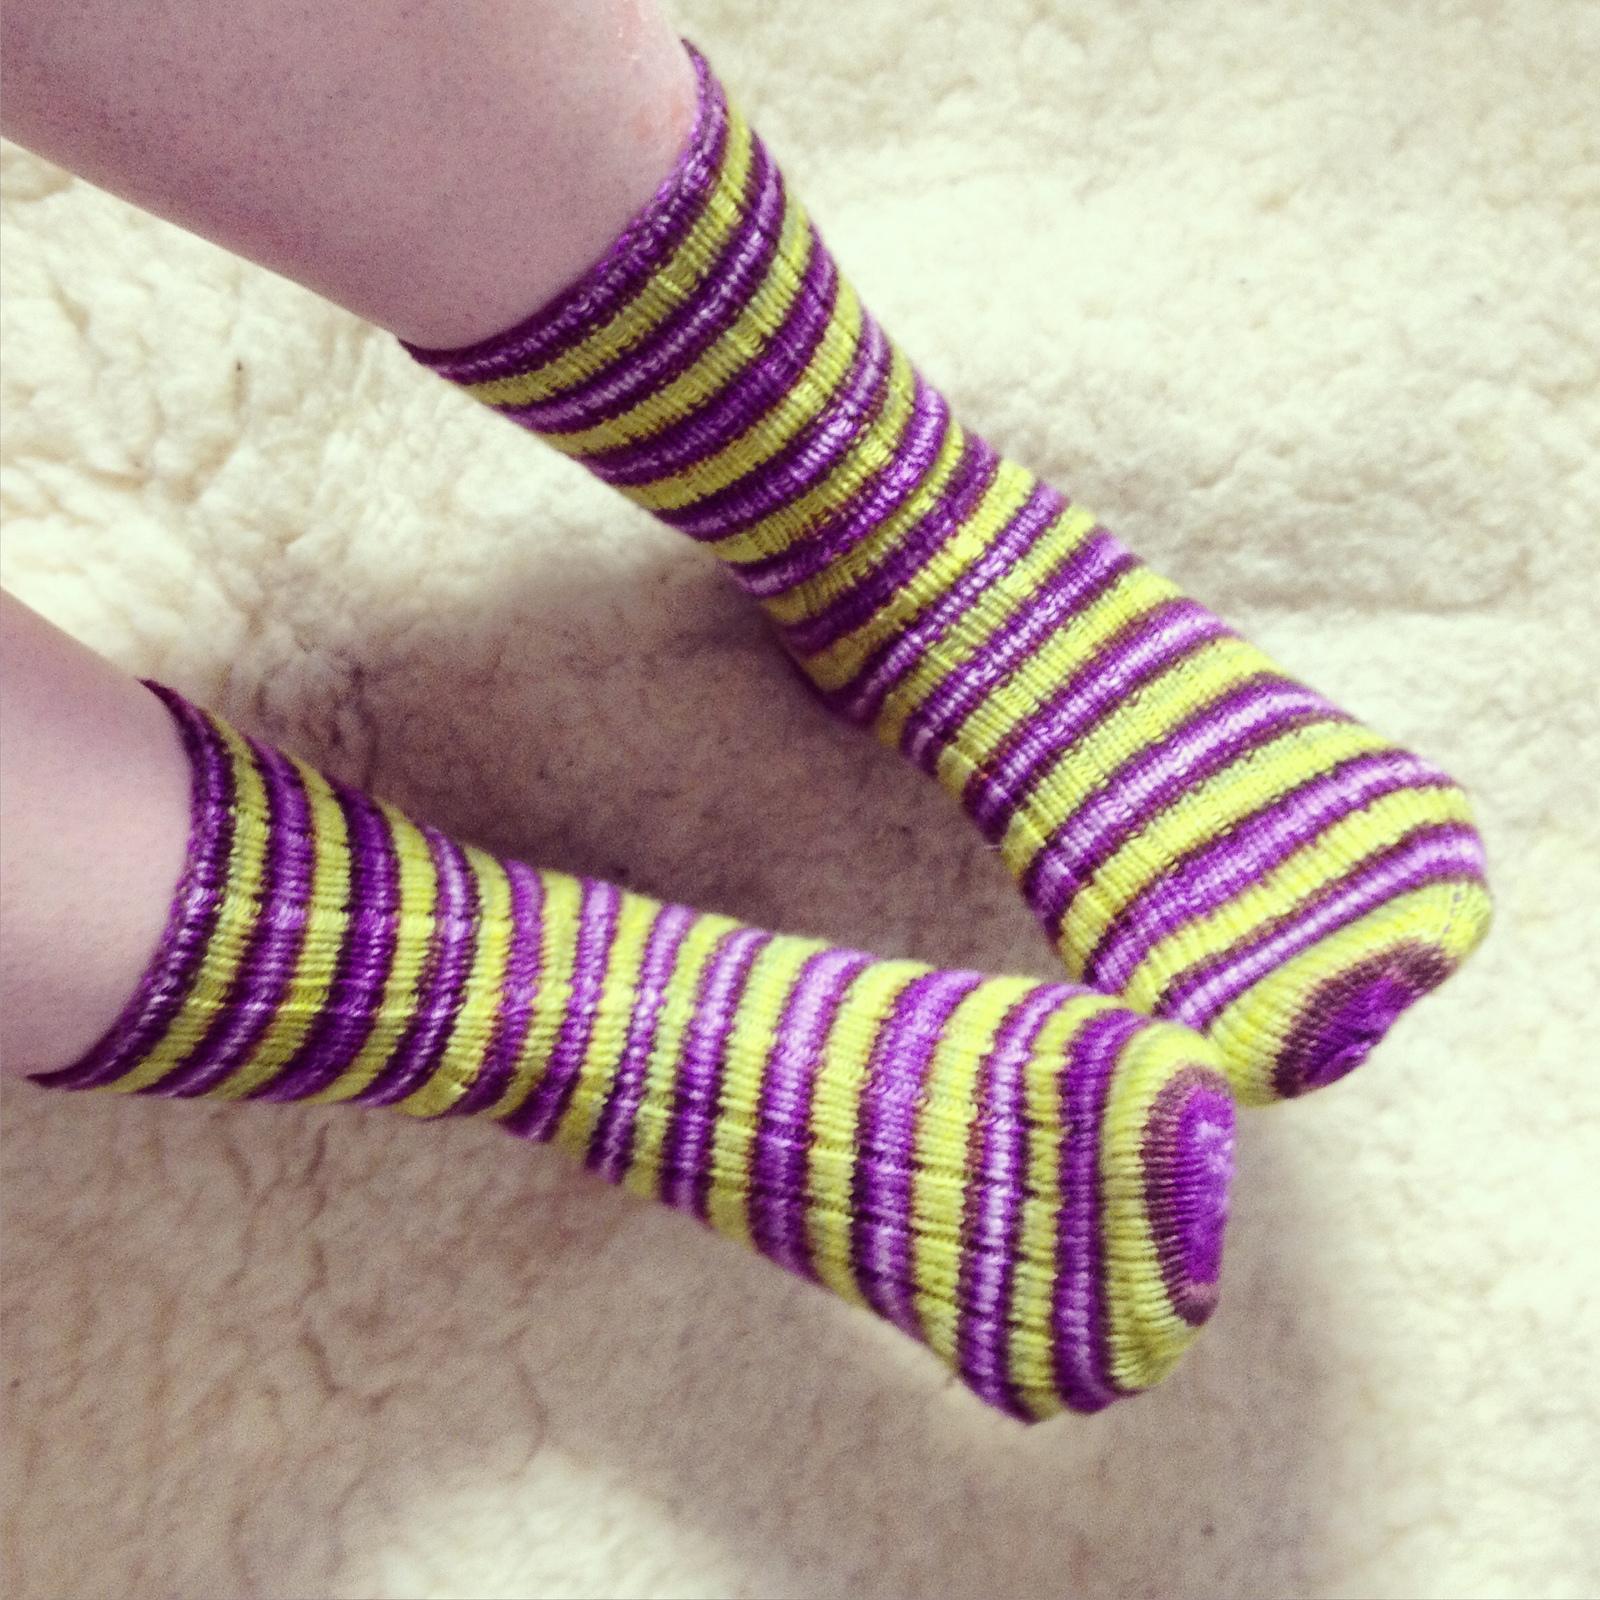 Ribbed socks in 'Leaky Cauldron' Self-Striping Yarn by Biscotte Yarns